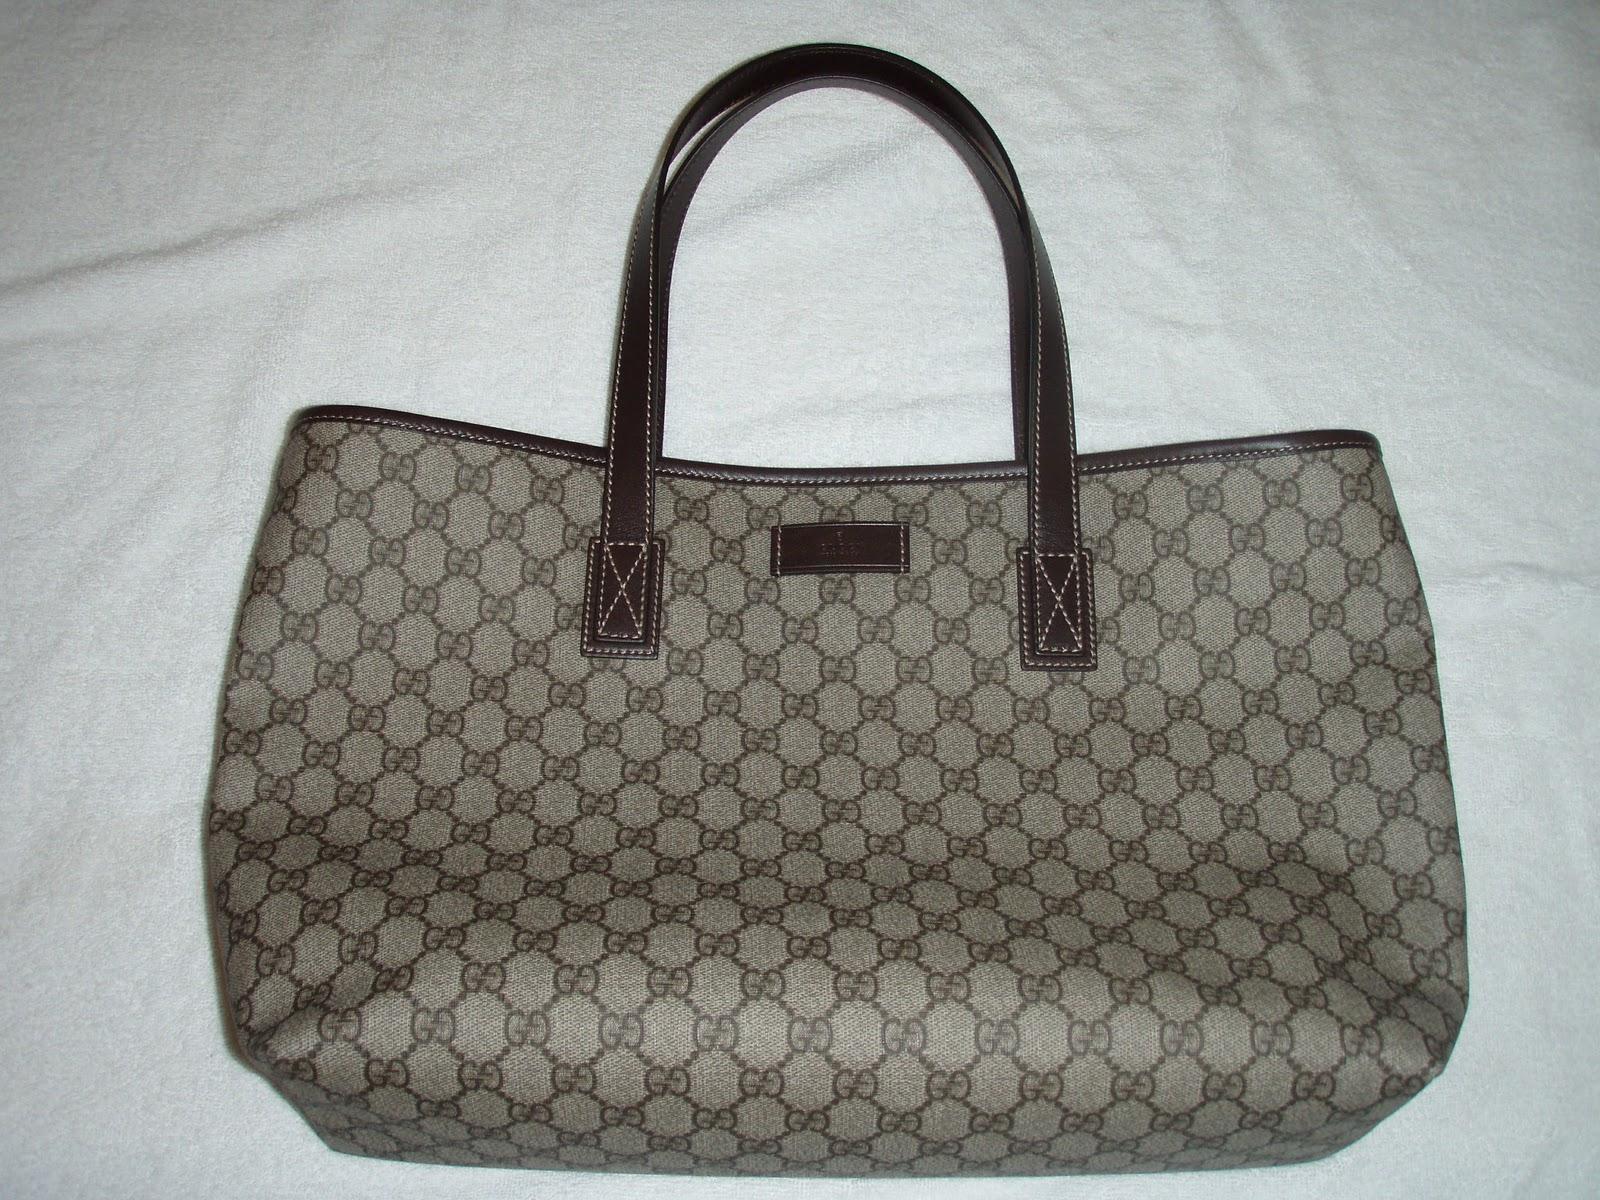 Gucci 211137 492174 Medium Tote Coach Bag On Sale